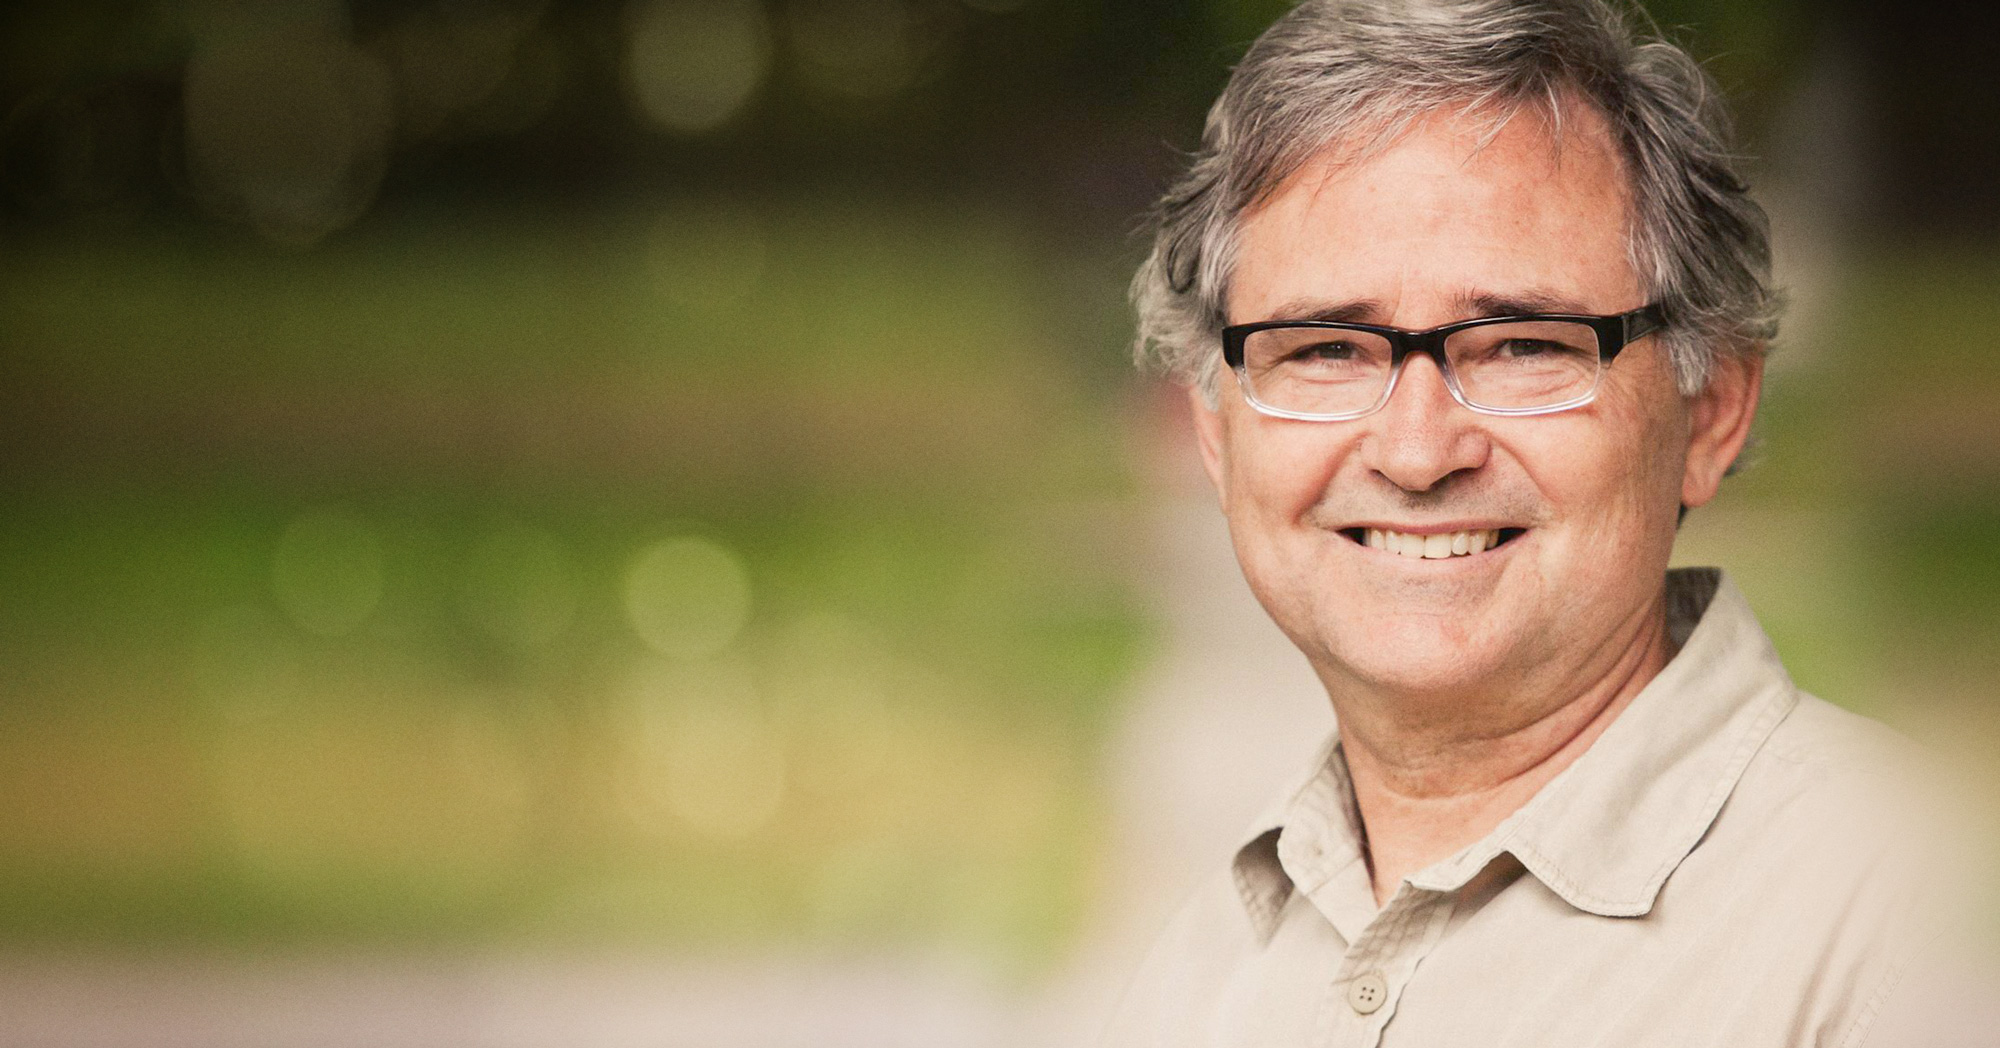 Jerry Steingard